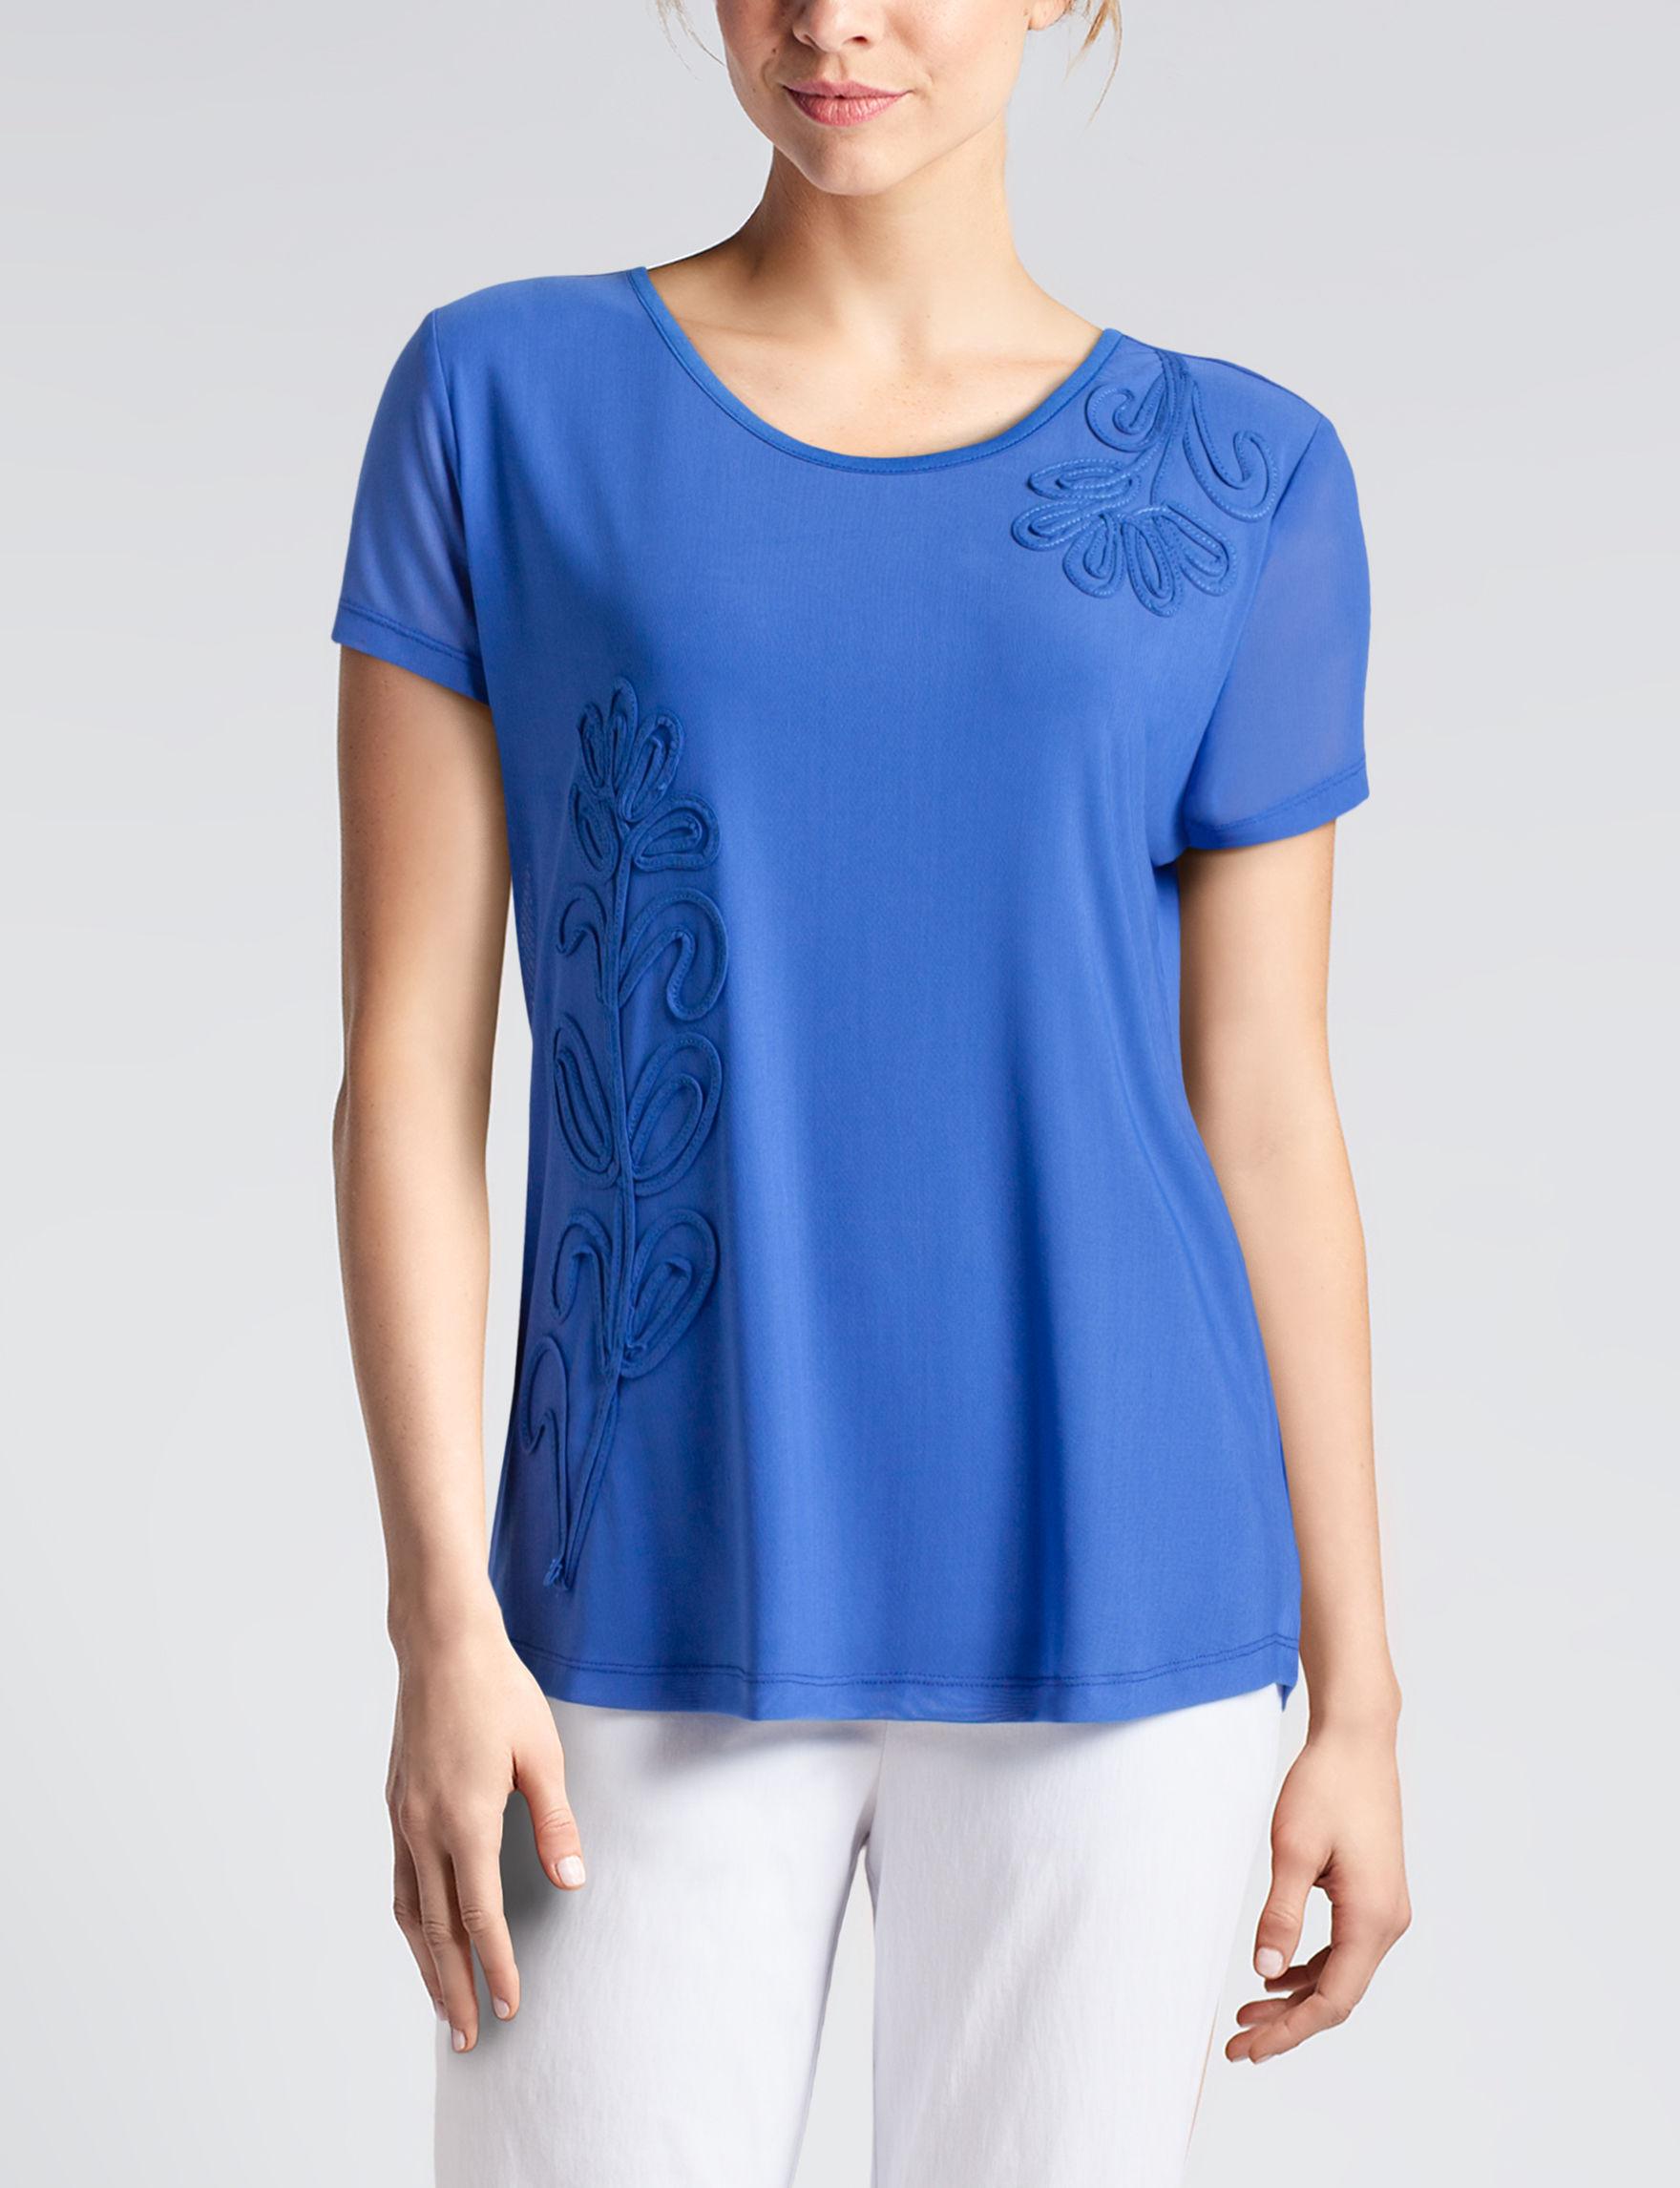 Rebecca Malone Royal Blue Shirts & Blouses